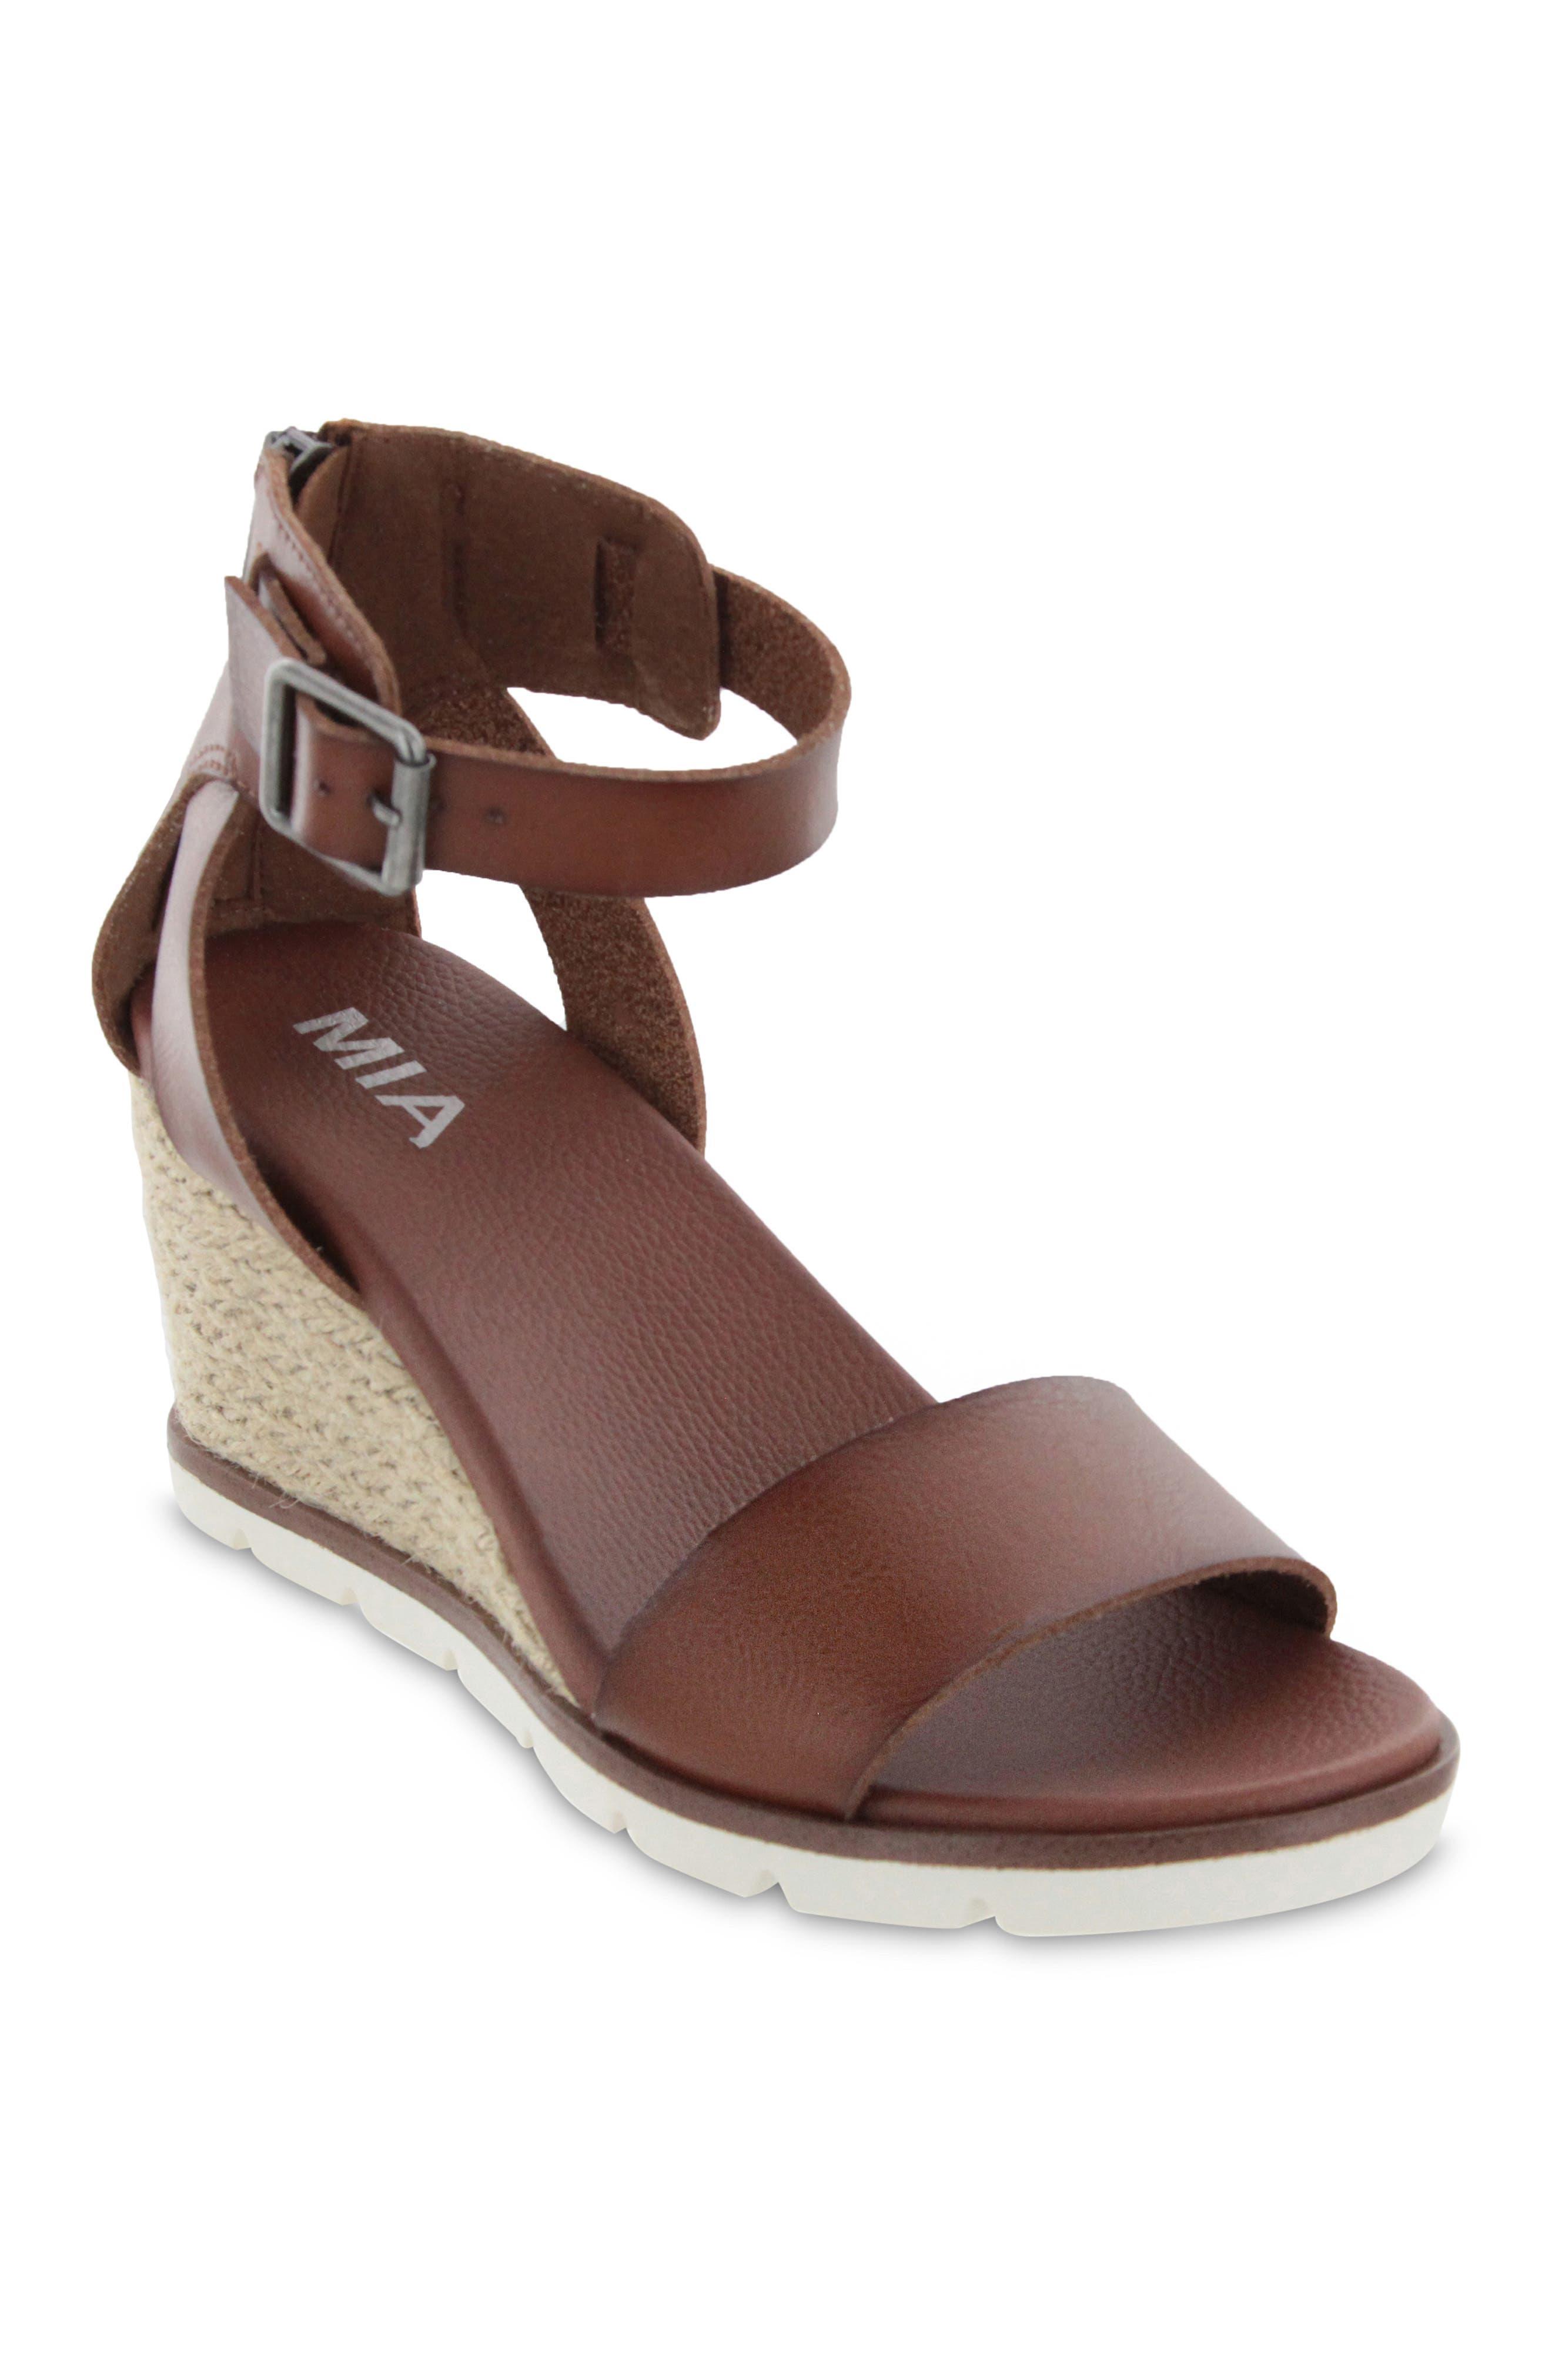 Betsy Espadrille Wedge Sandal